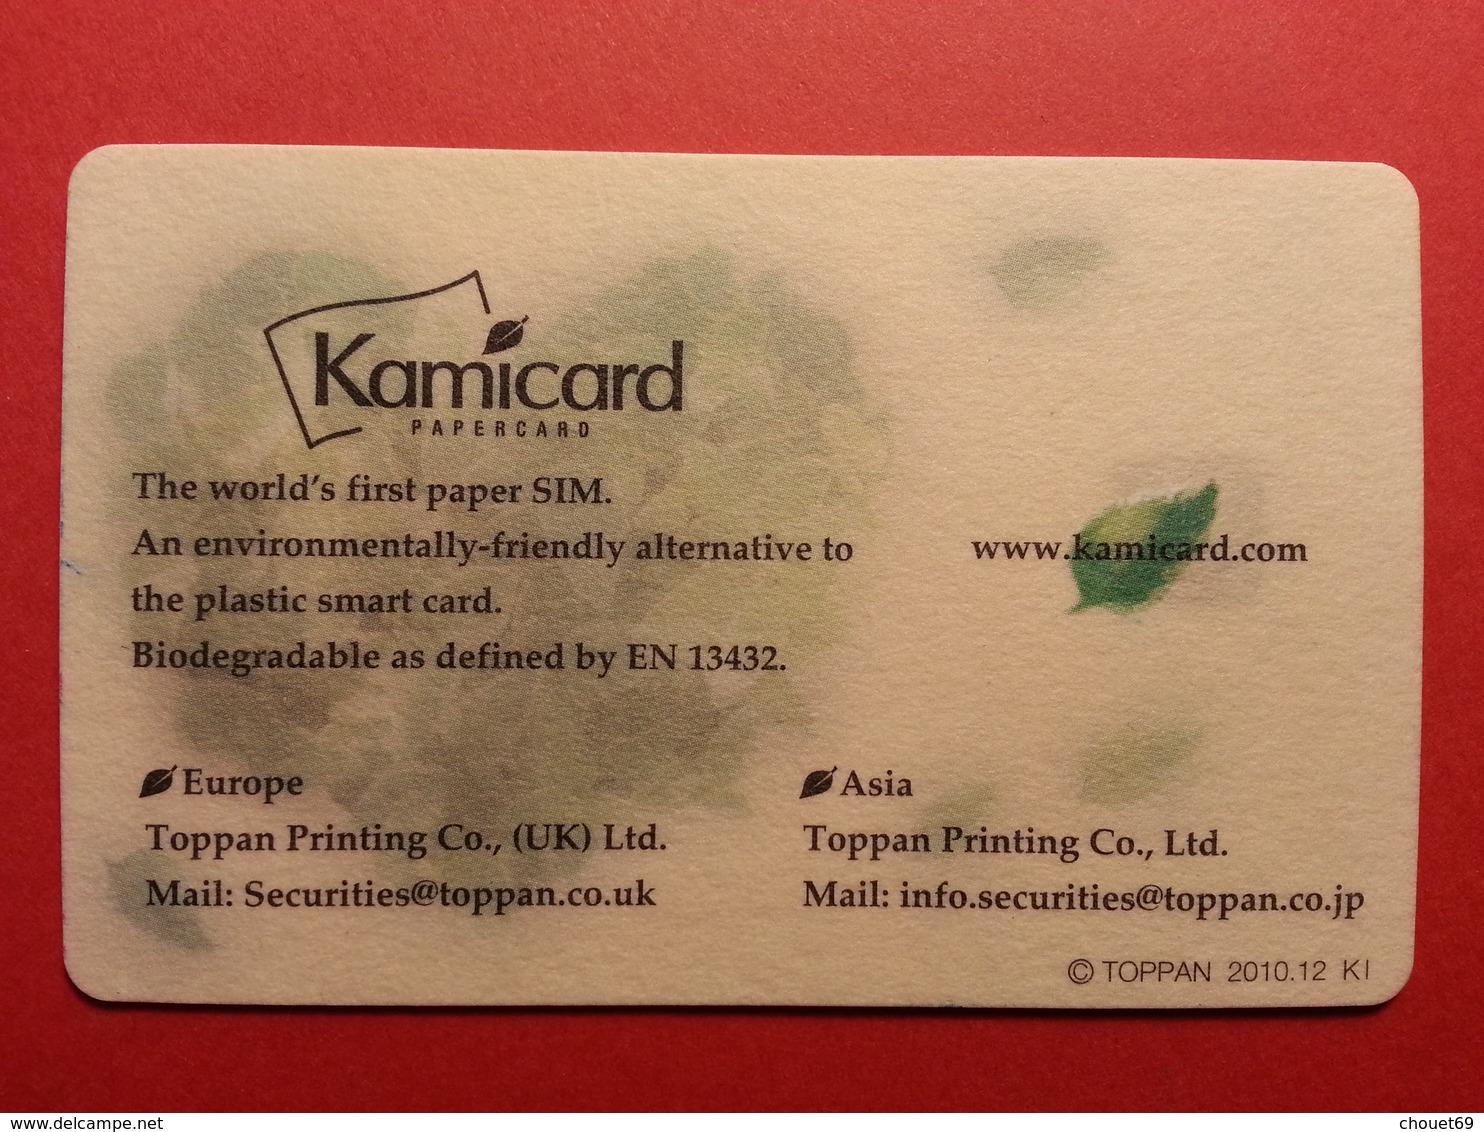 China - MUSTER Coeur TOPPAN Paper GSM SIM Kamicard Mint DEMO TEST TRIAL (SACROC) - Chine